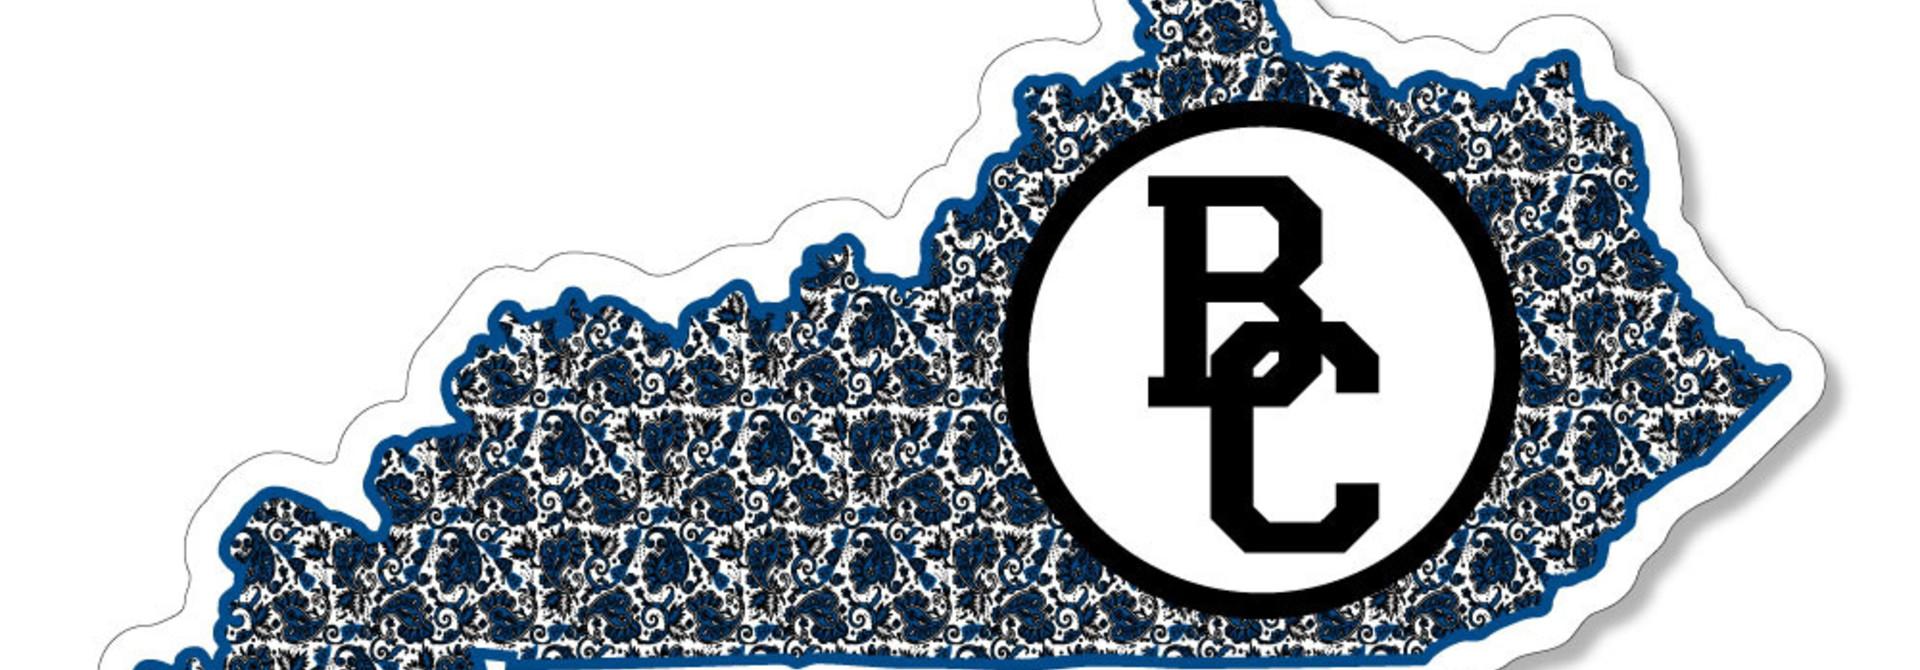 BC logo on KY Dizzler Sticker